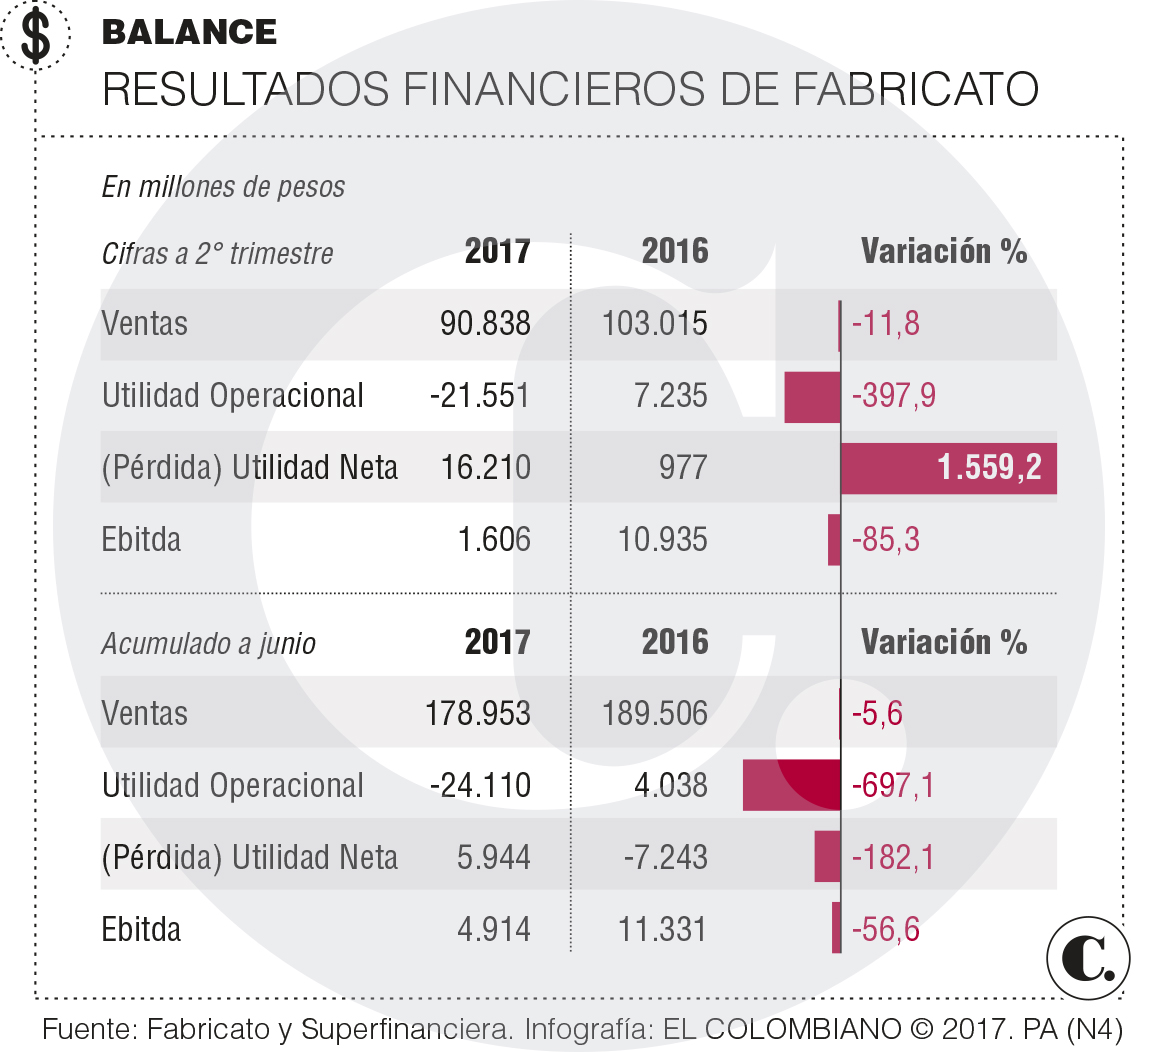 Fabricato presentó su balance a junio